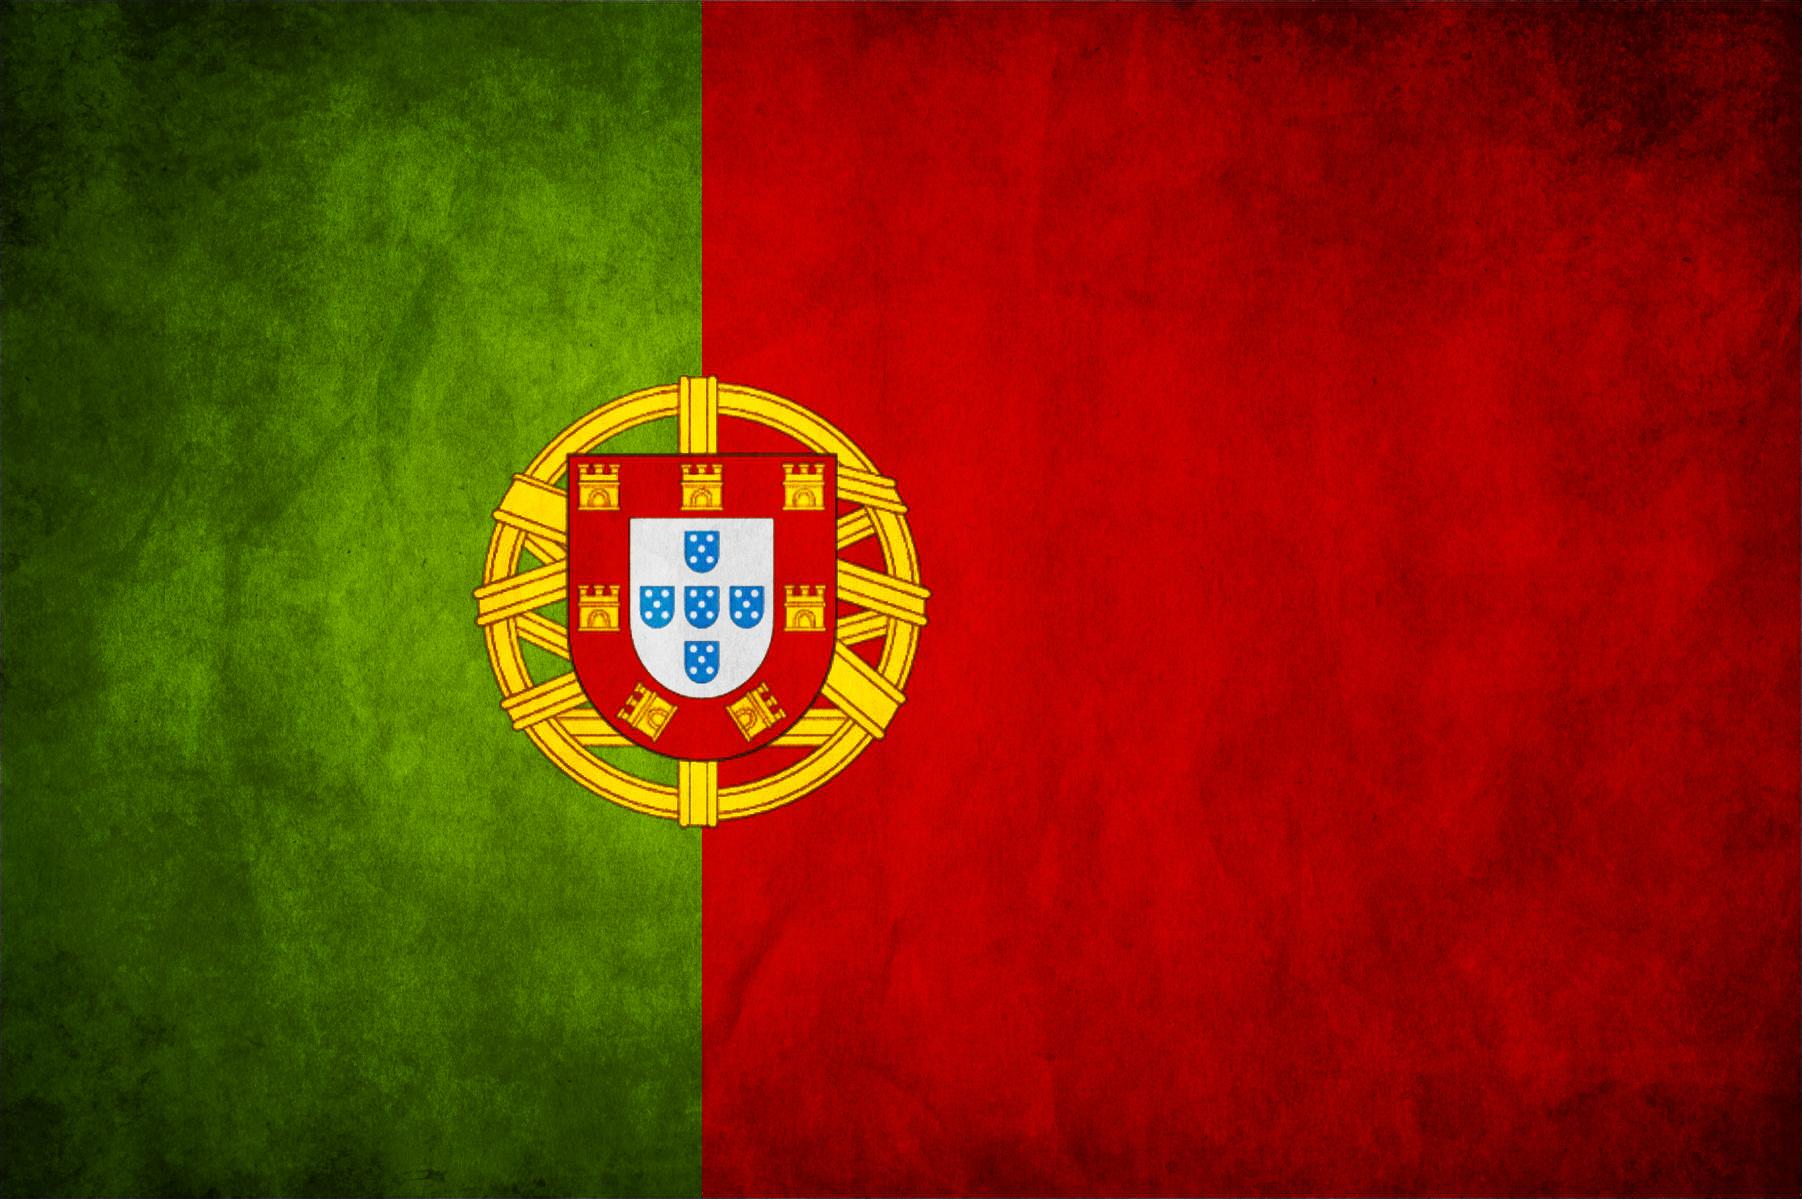 portugal wallpaper - photo #21